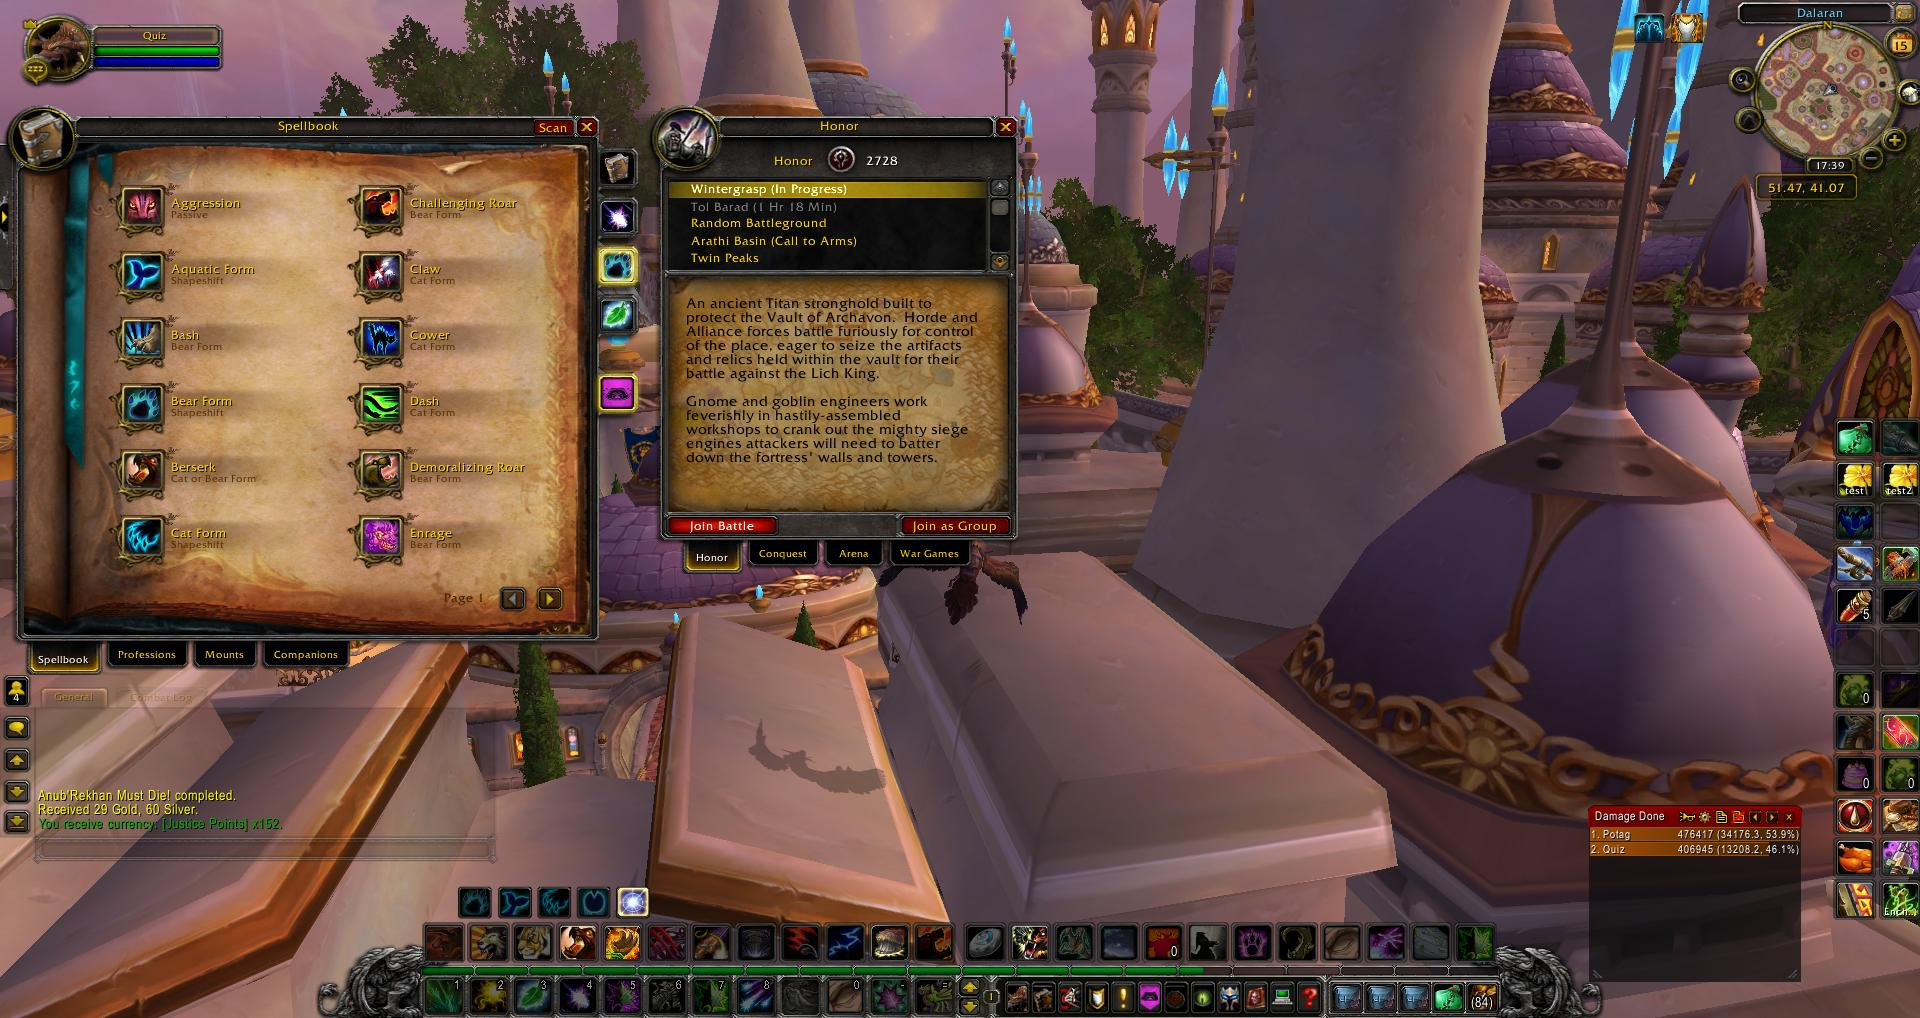 Spellbook Druid wow wow screenshot - Gamingcfg com